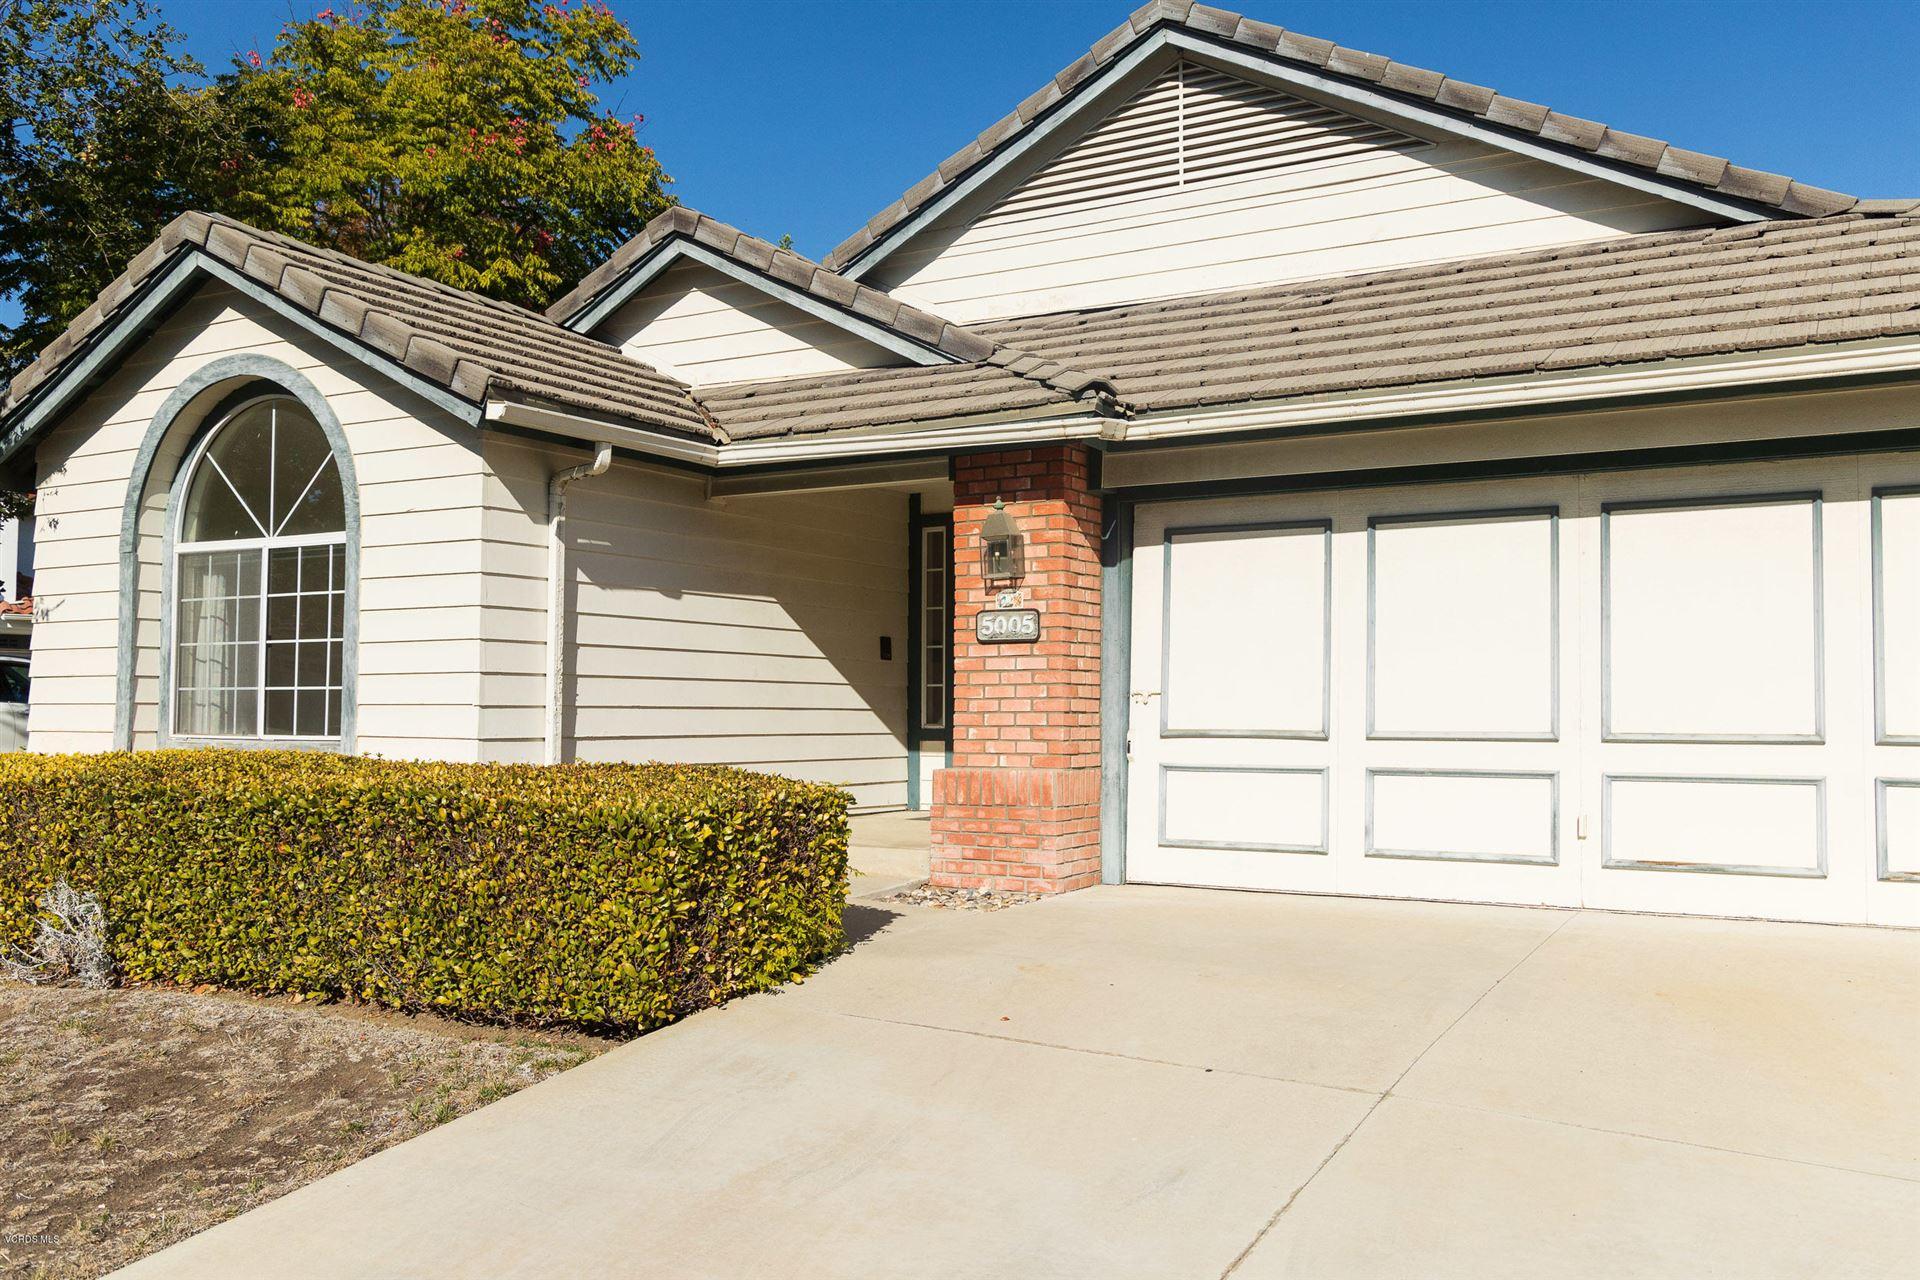 5005 Evanwood Avenue, Oak Park, CA 91377 - MLS#: 220011086